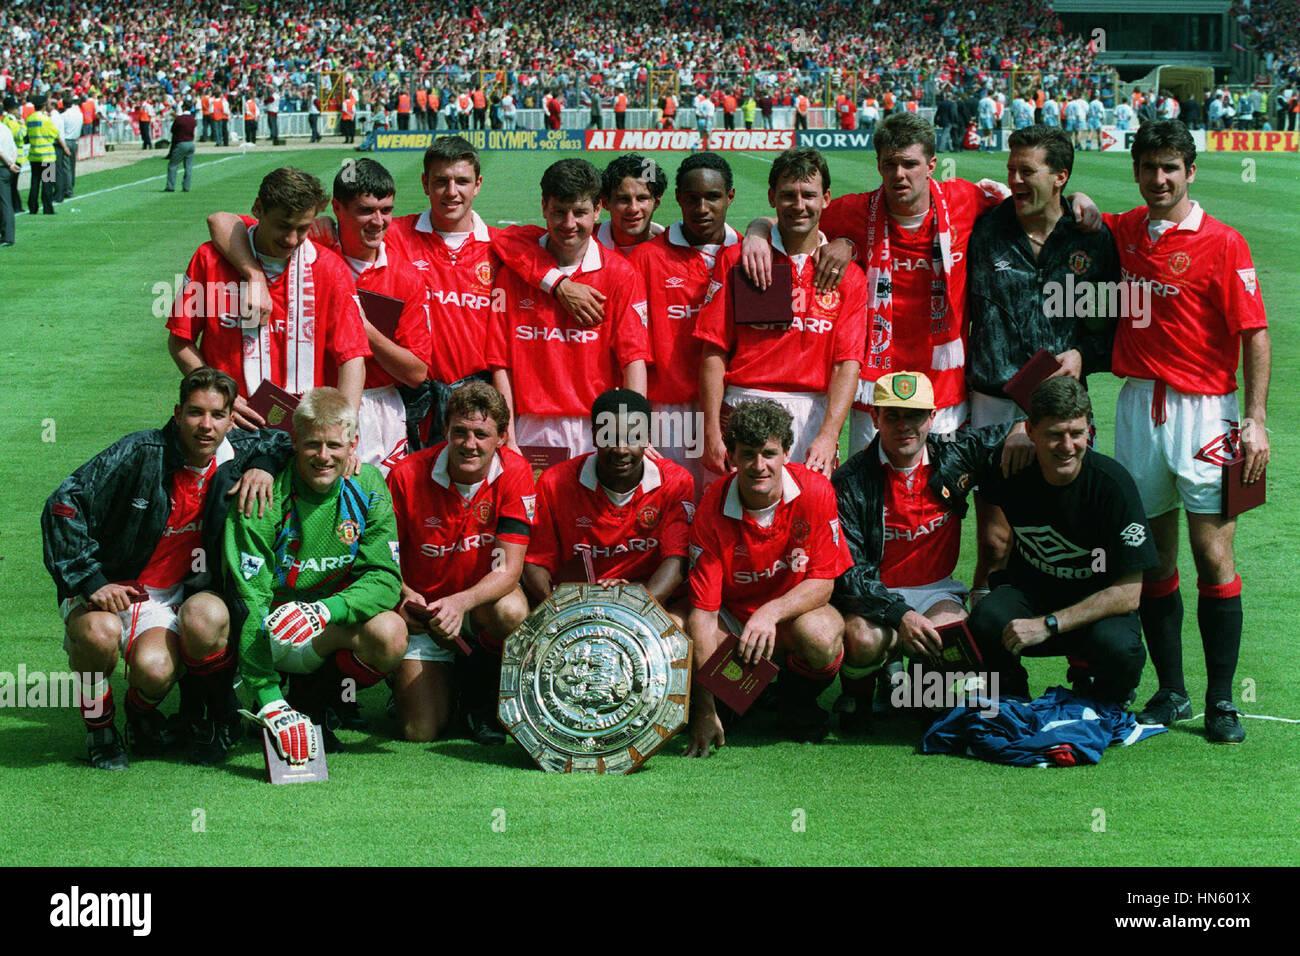 1993 FA Charity Shield